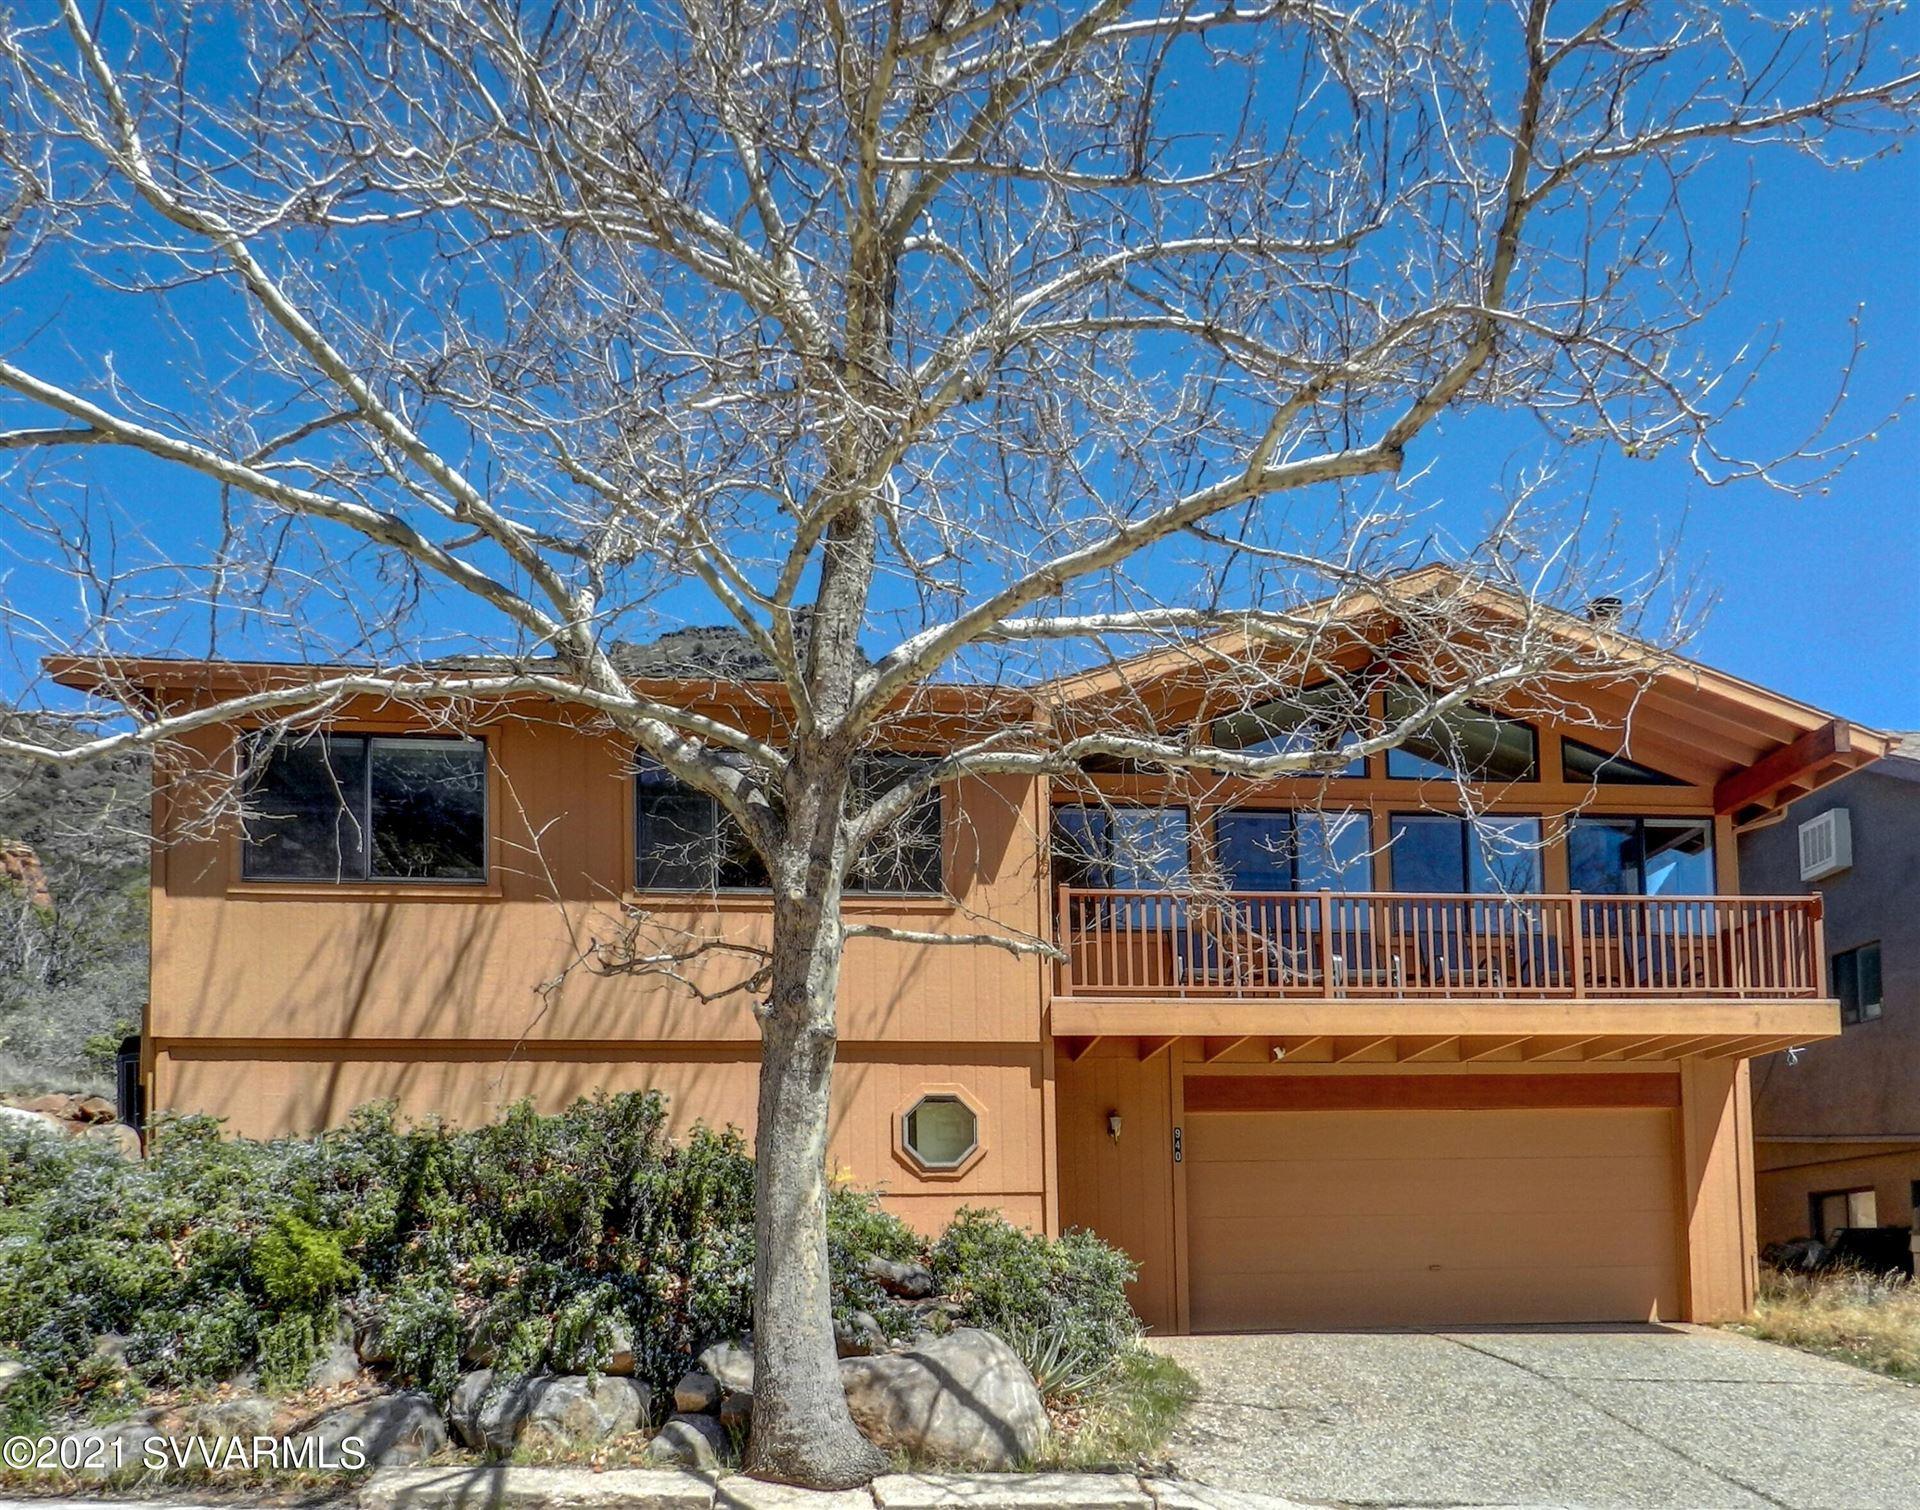 Photo of 940 Julie Lane, Sedona, AZ 86336 (MLS # 526096)